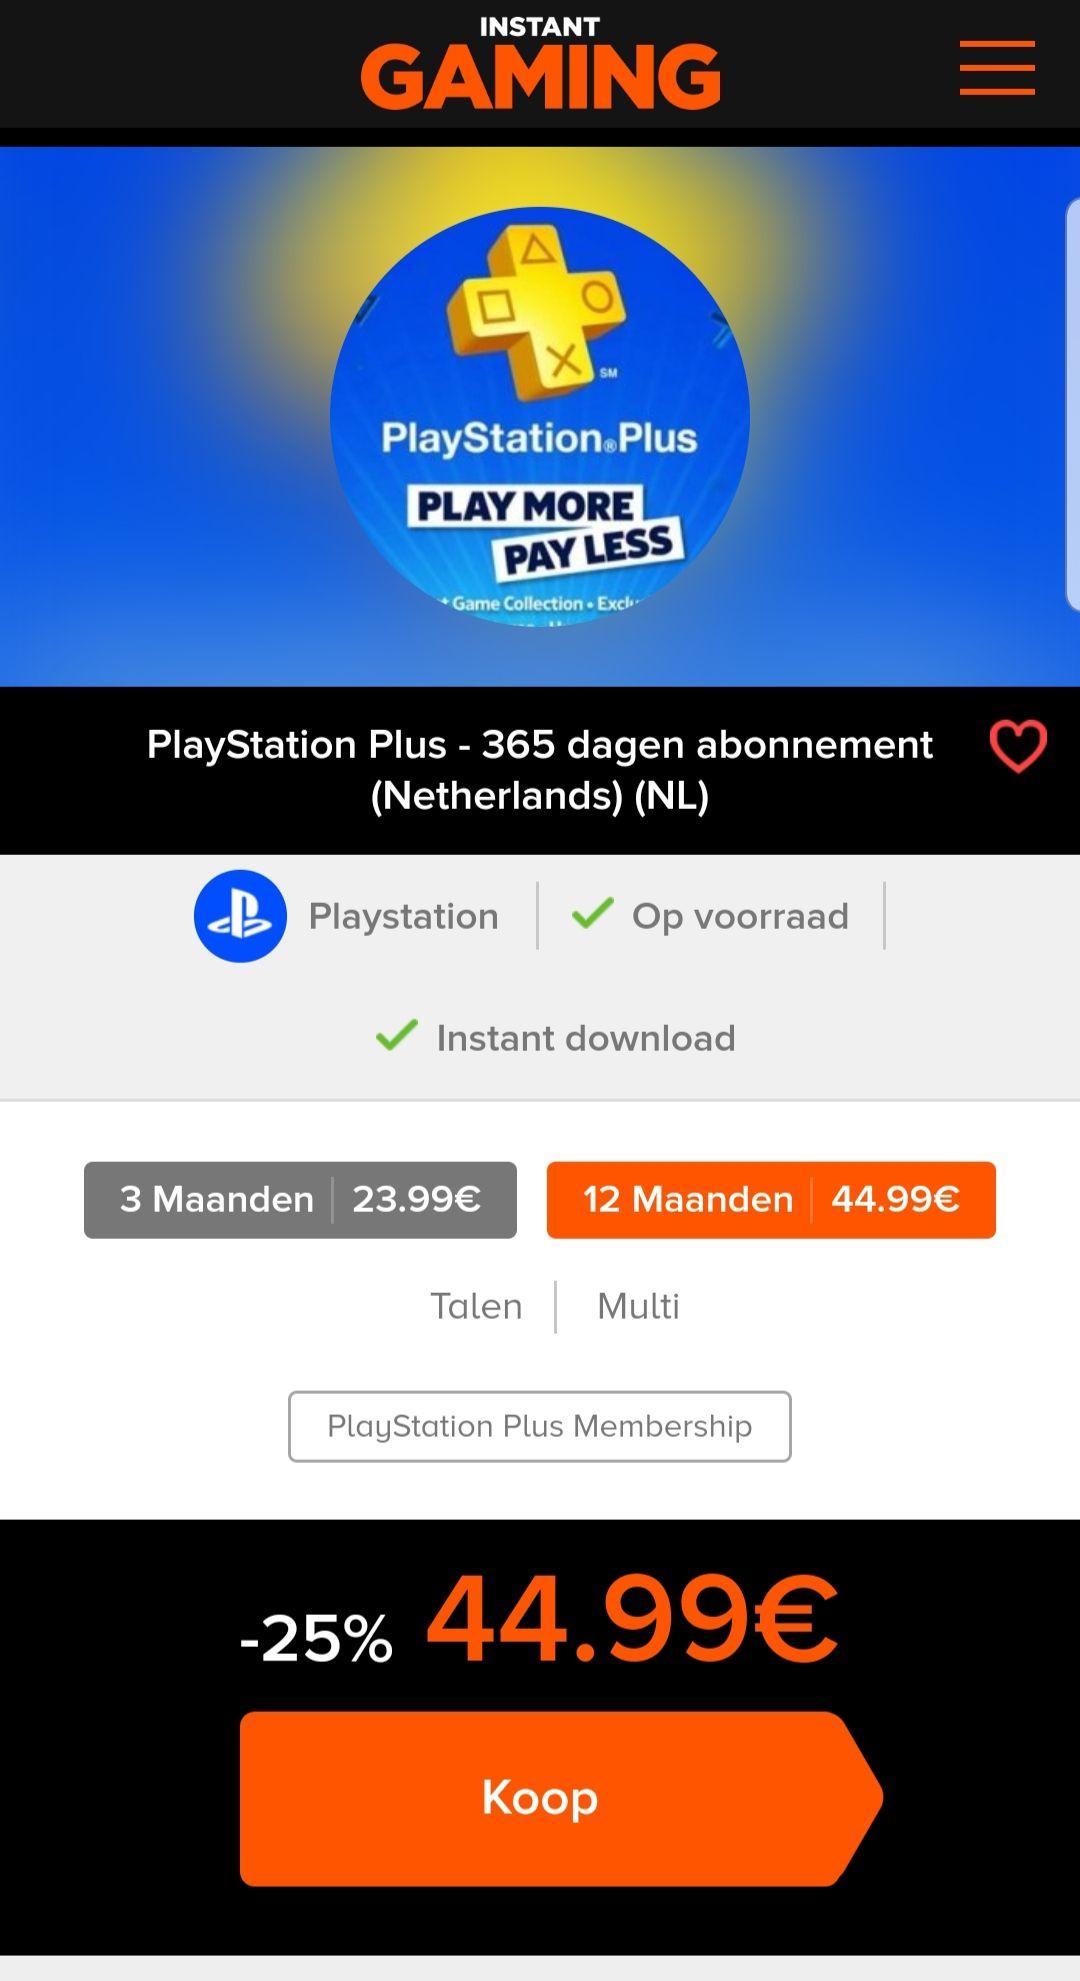 Playstation plus voor 1 jaar @Instant-gaming